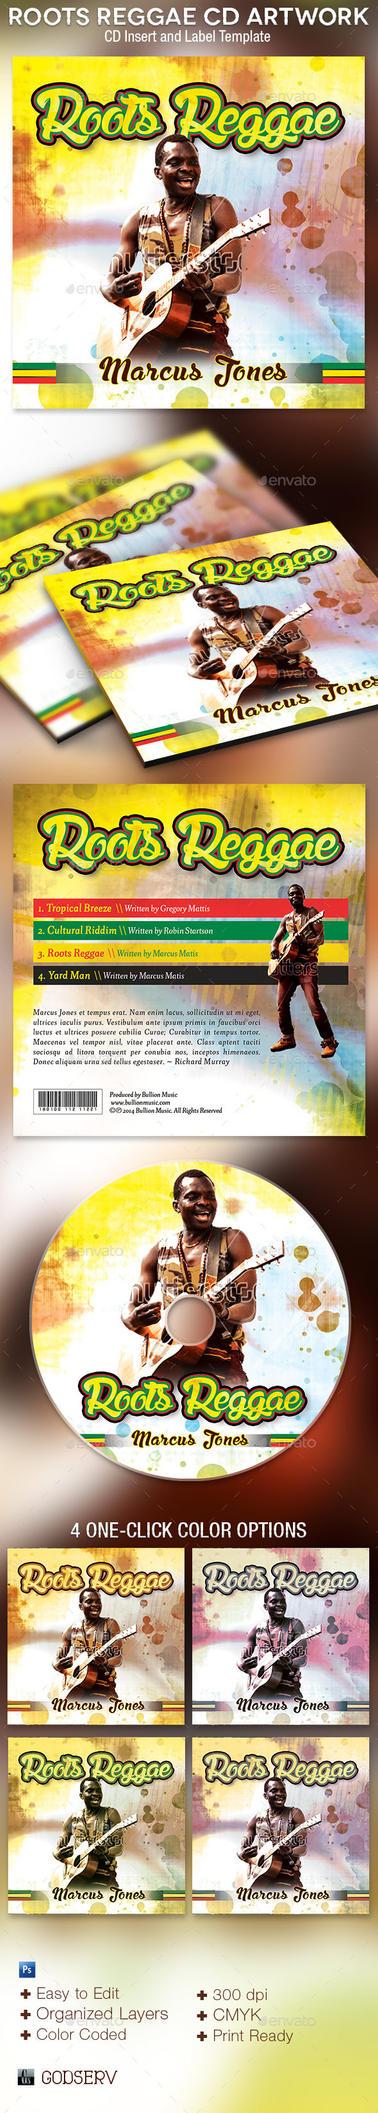 Roots Reggae CD Artwork Photoshop Template by Godserv